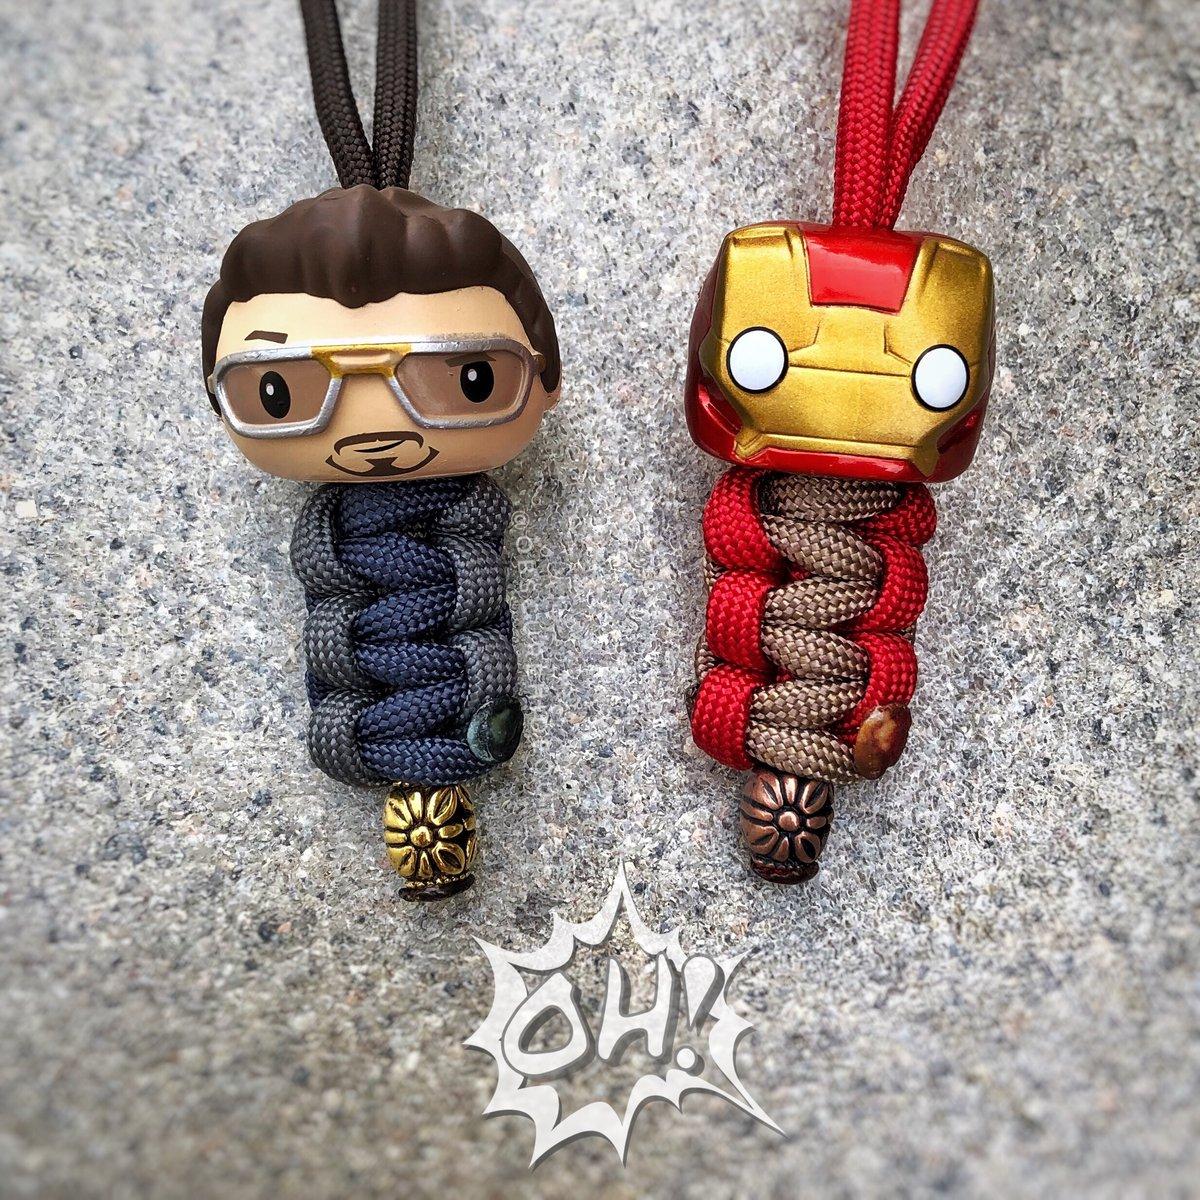 Image of Iron-Man